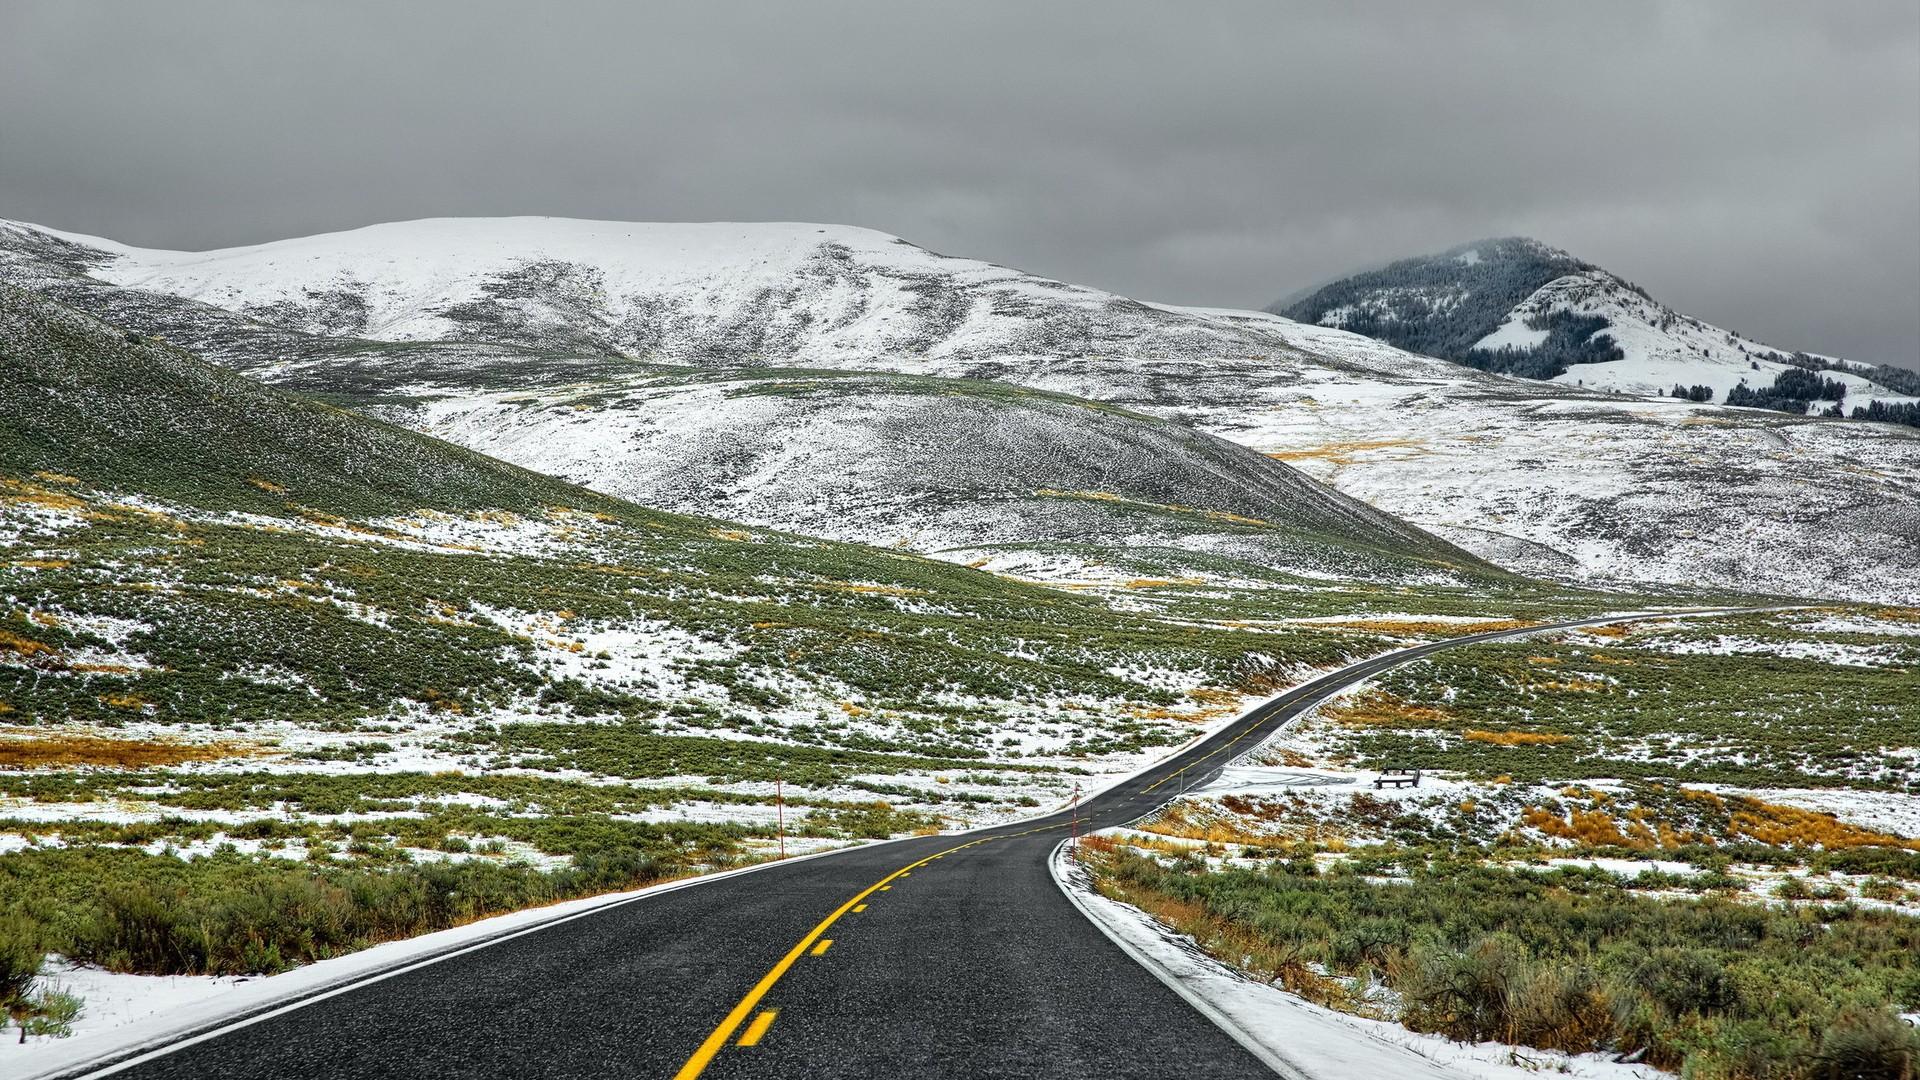 General 1920x1080 landscape road winter overcast hills mountains snow plains shrubs